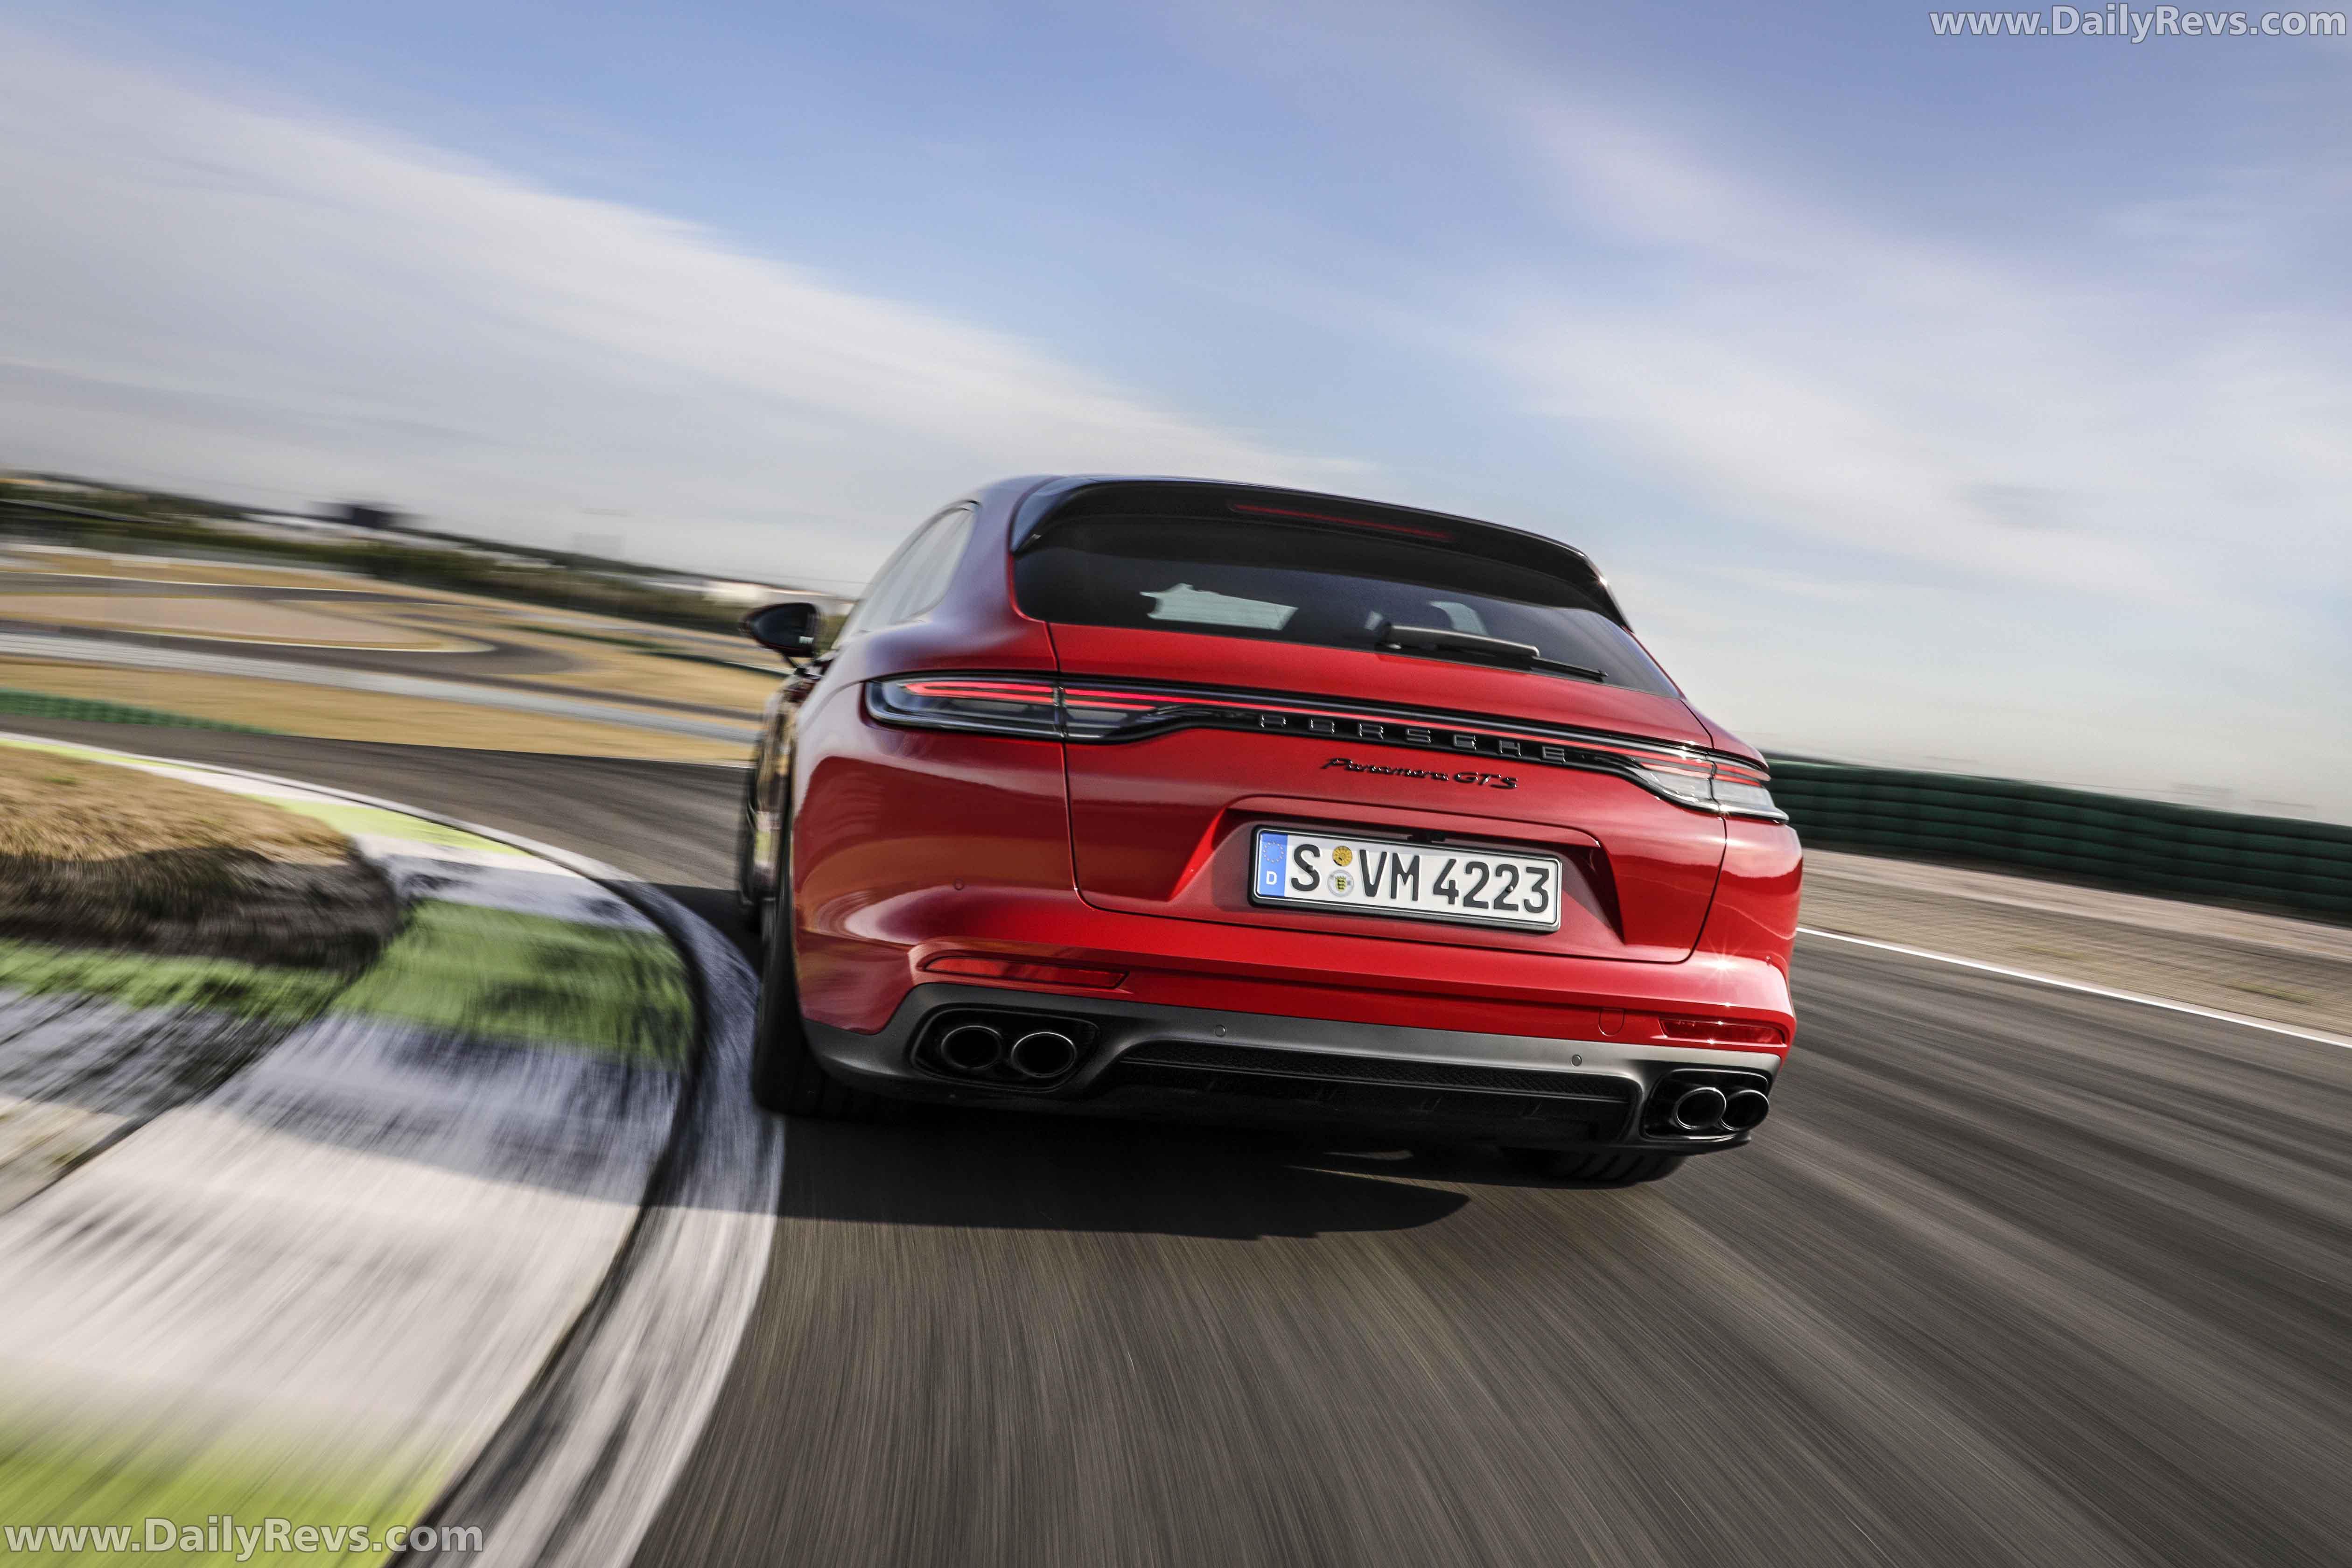 2021 Porsche Panamera GTS Sports Turismo - Dailyrevs